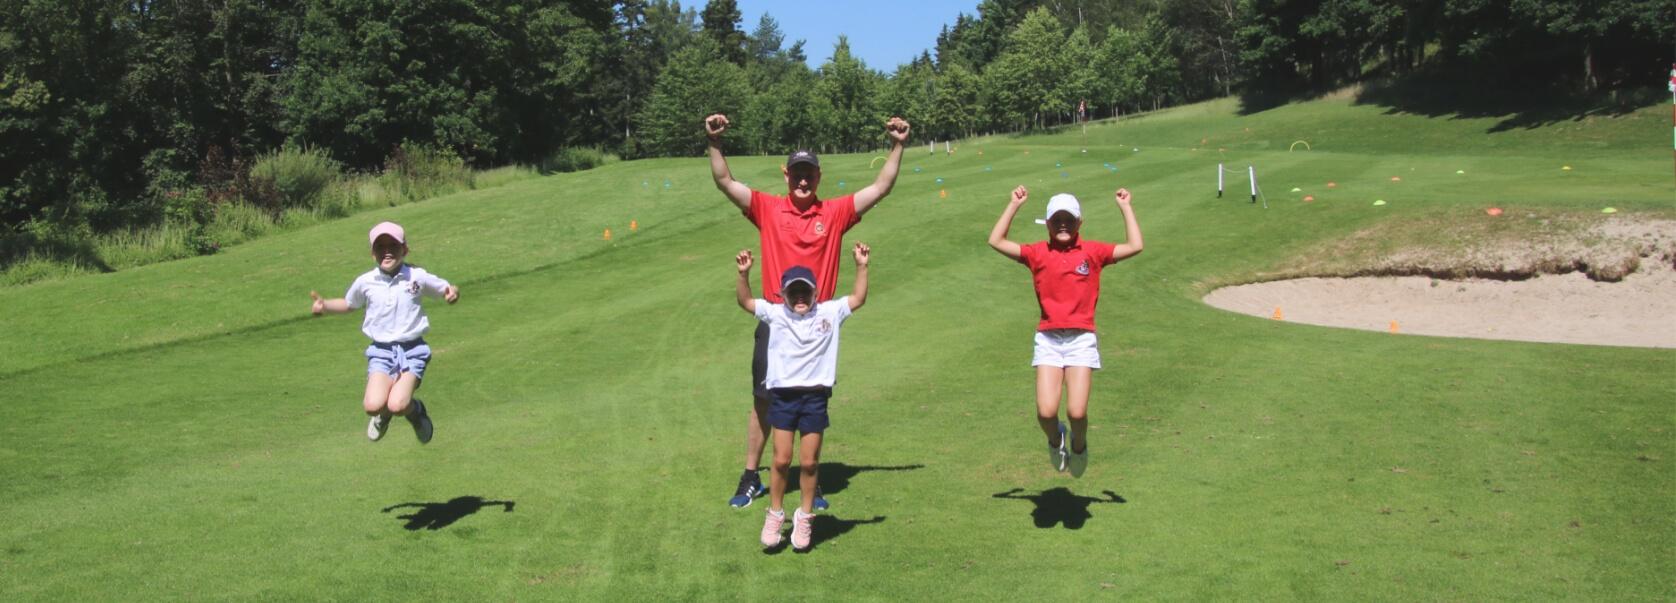 Golf- und Land-Club Regensburg e.V. Kinderbetreuung